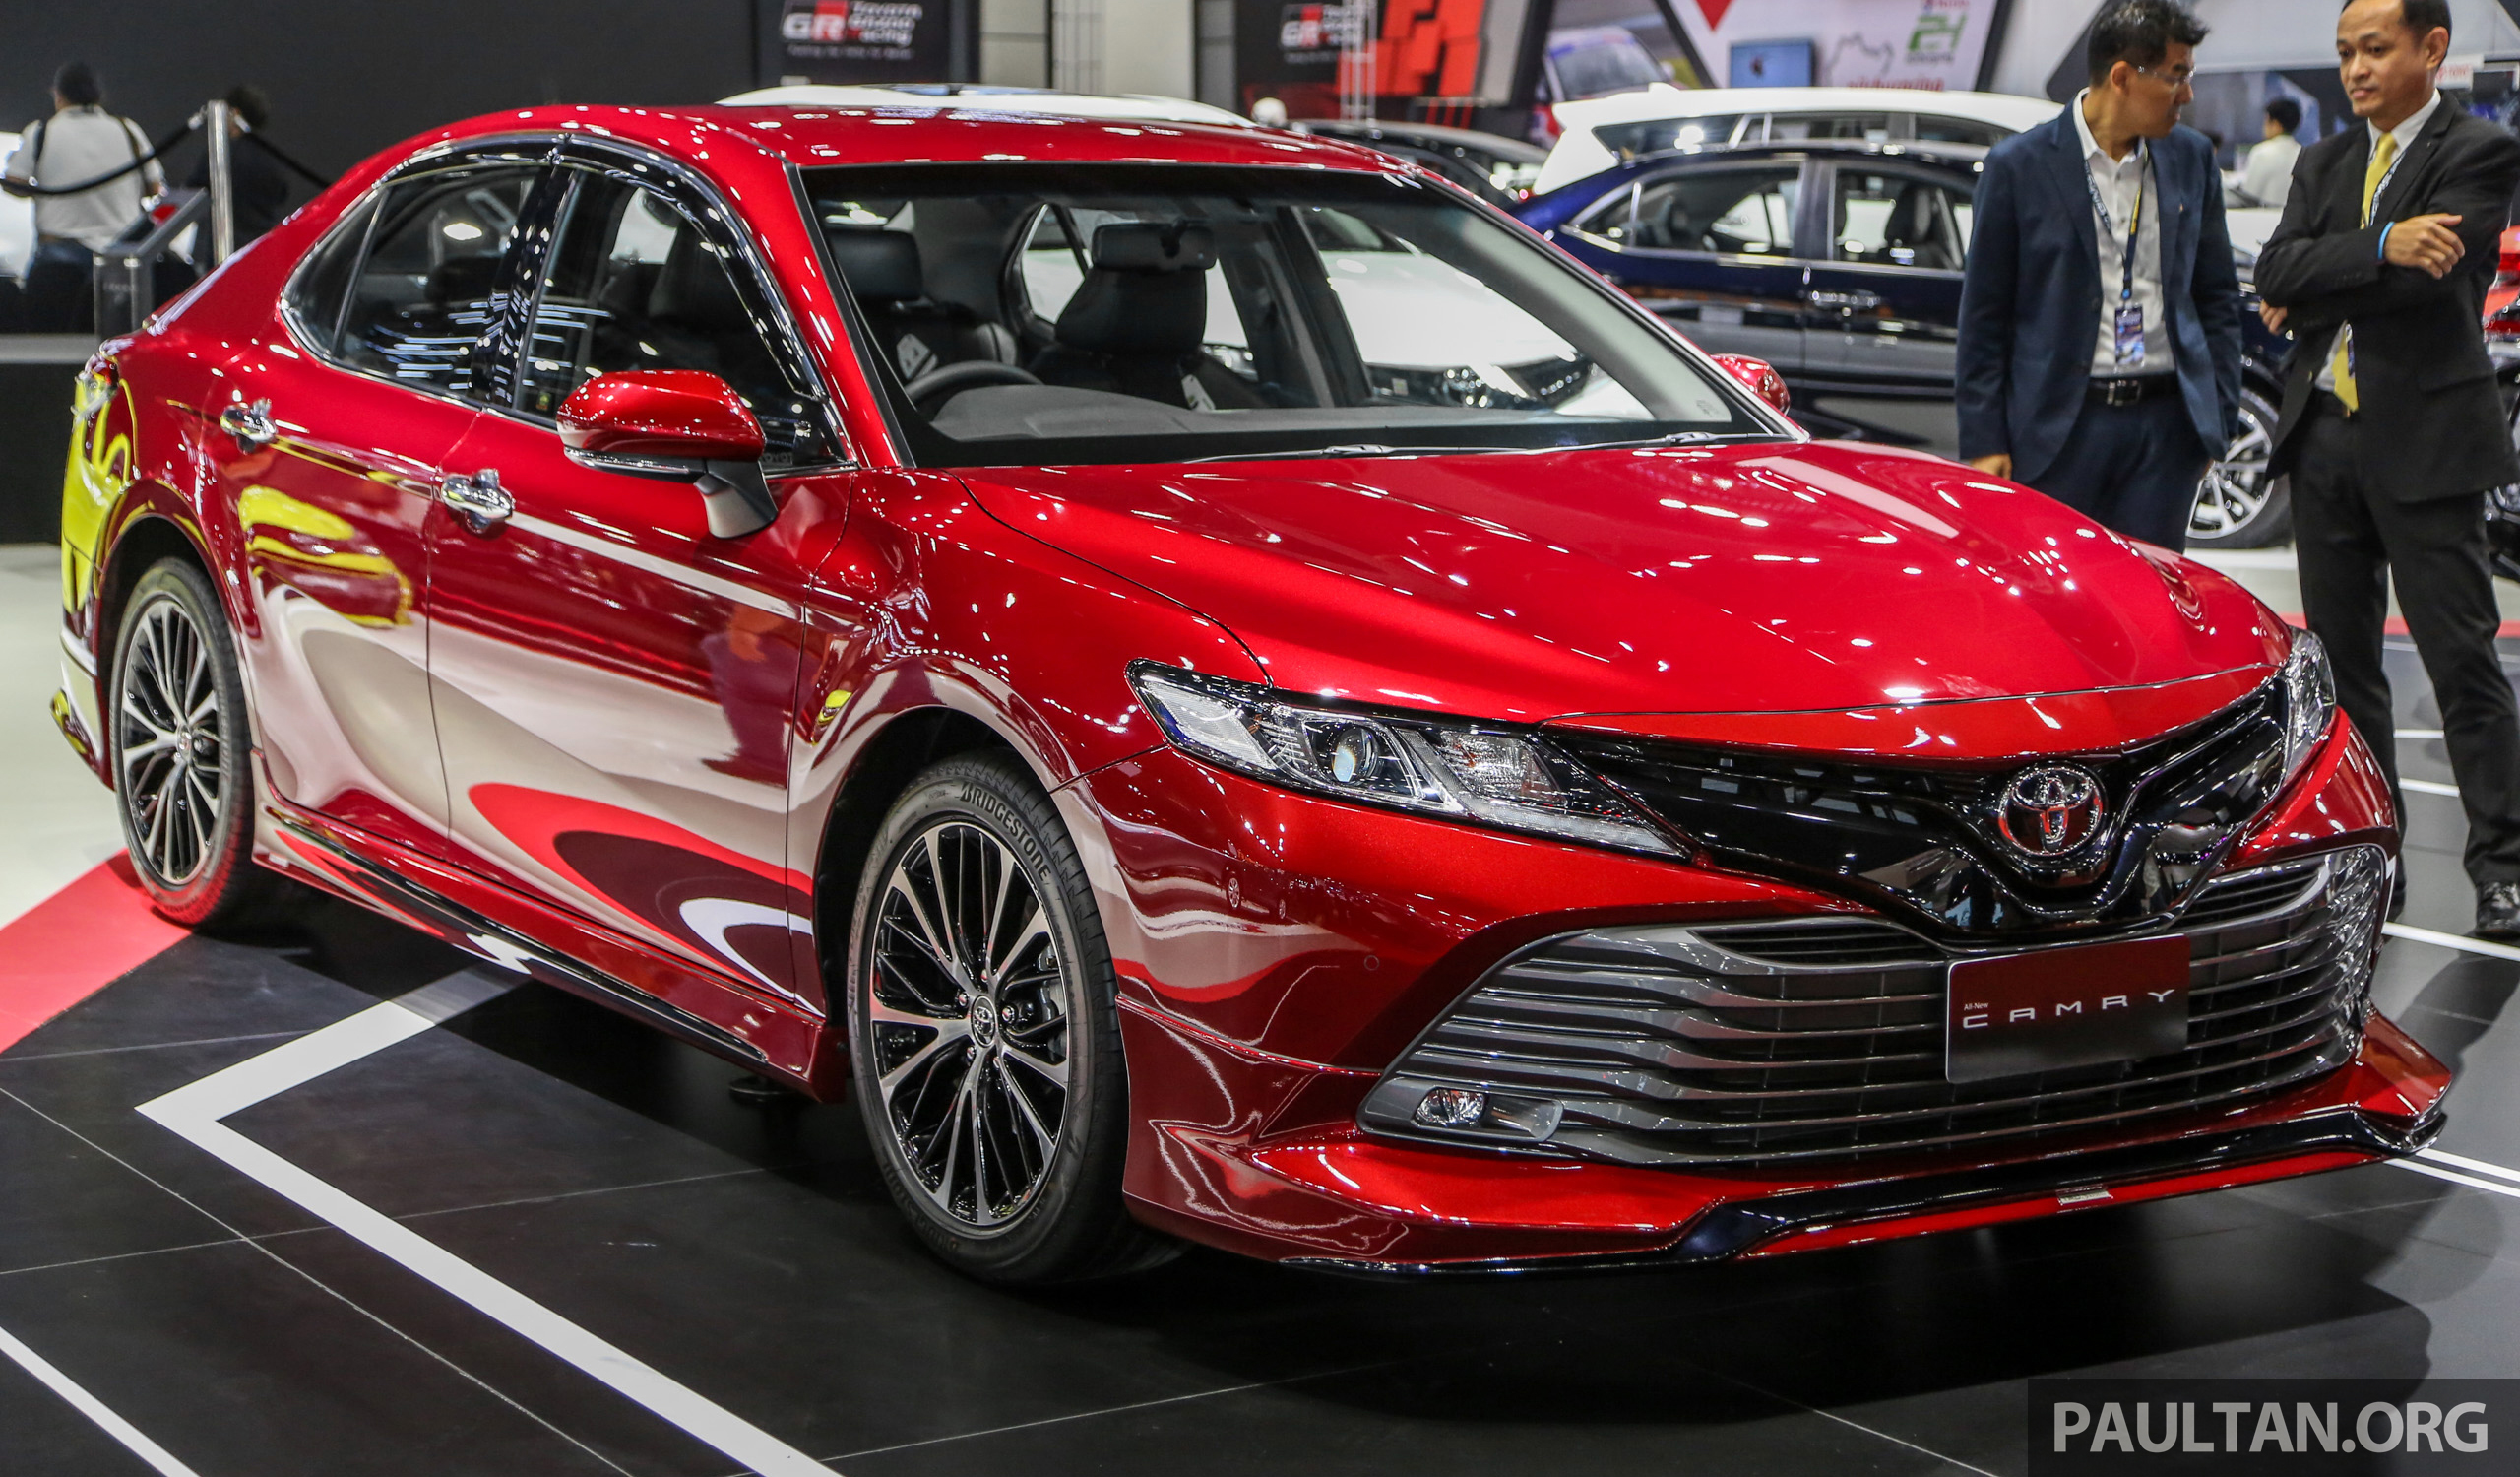 Kelebihan Harga Toyota Camry Spesifikasi